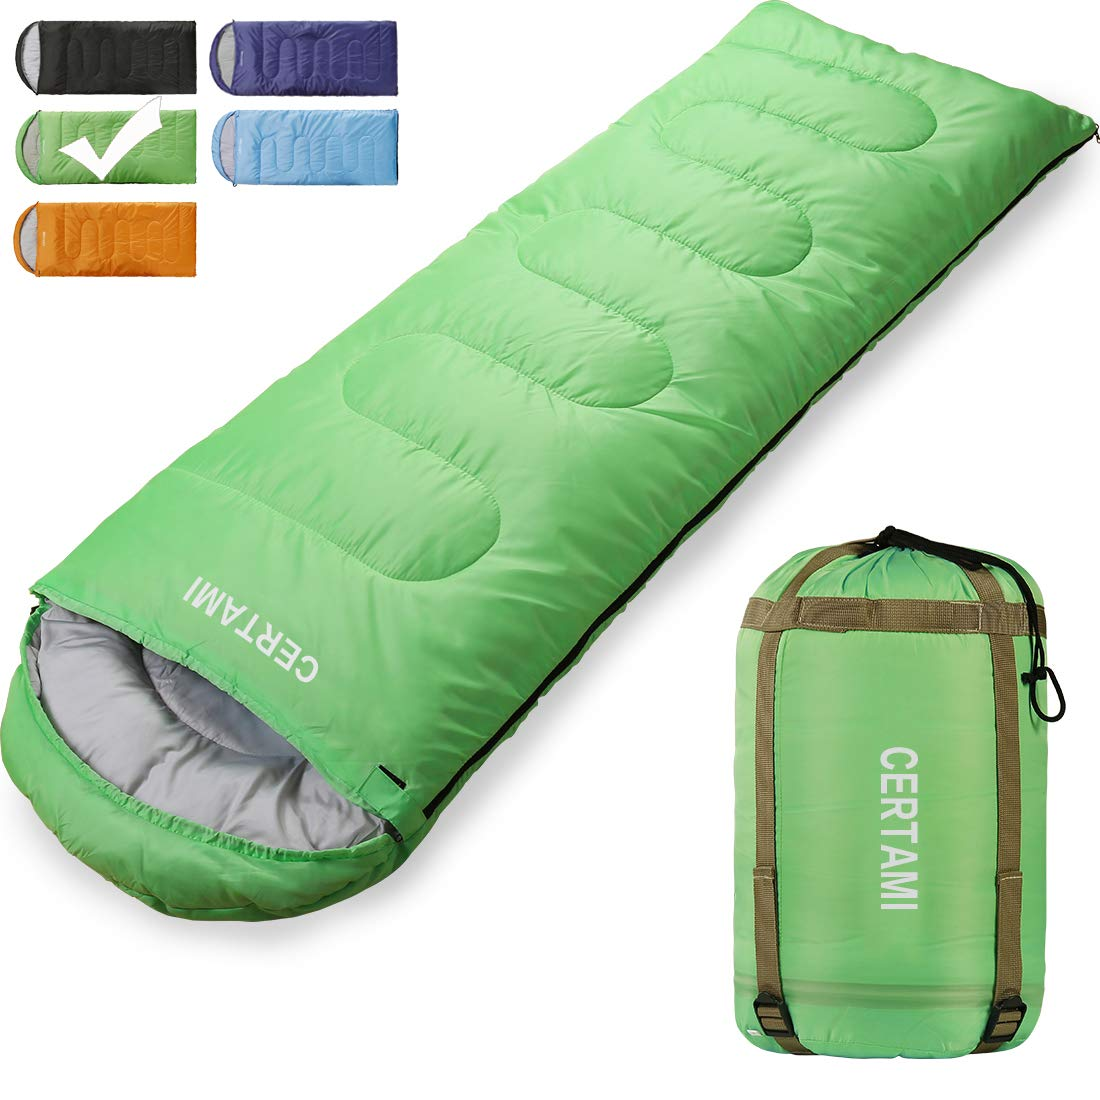 CER TAMI Lightweight Waterproof Backpacking